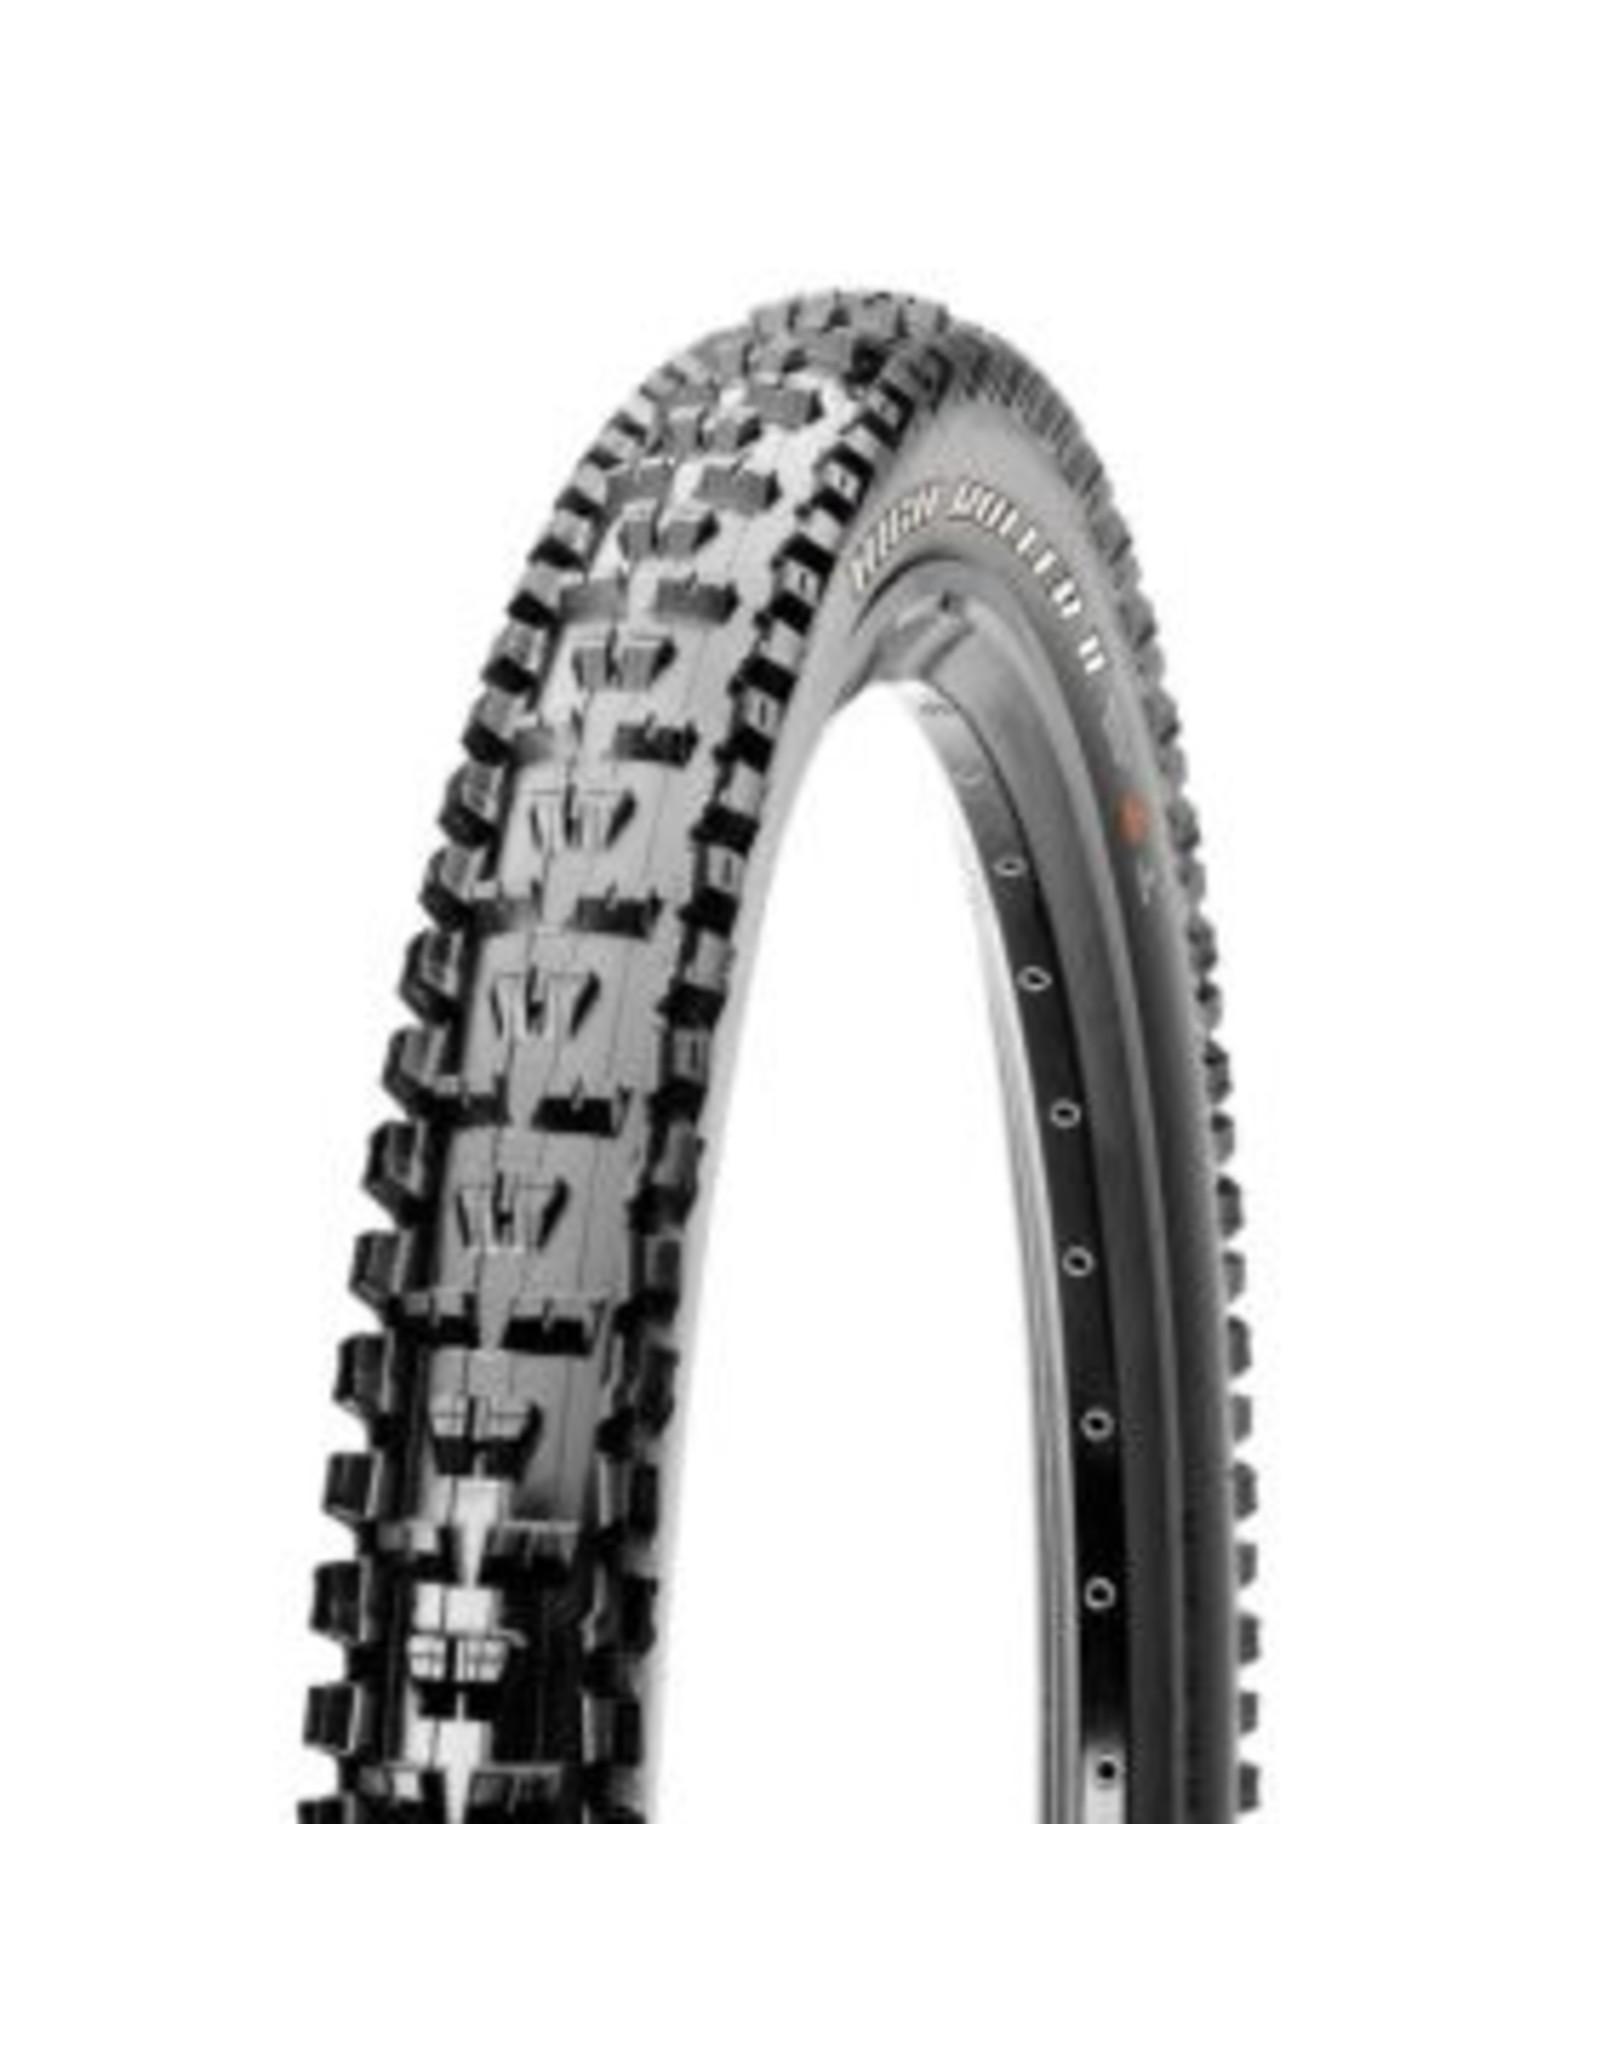 Maxxis High Roller II, 27.5x2.40, Pliable, 3C Maxx Terra, Tringle, EXO, 60TPI, 65PSI, Noir